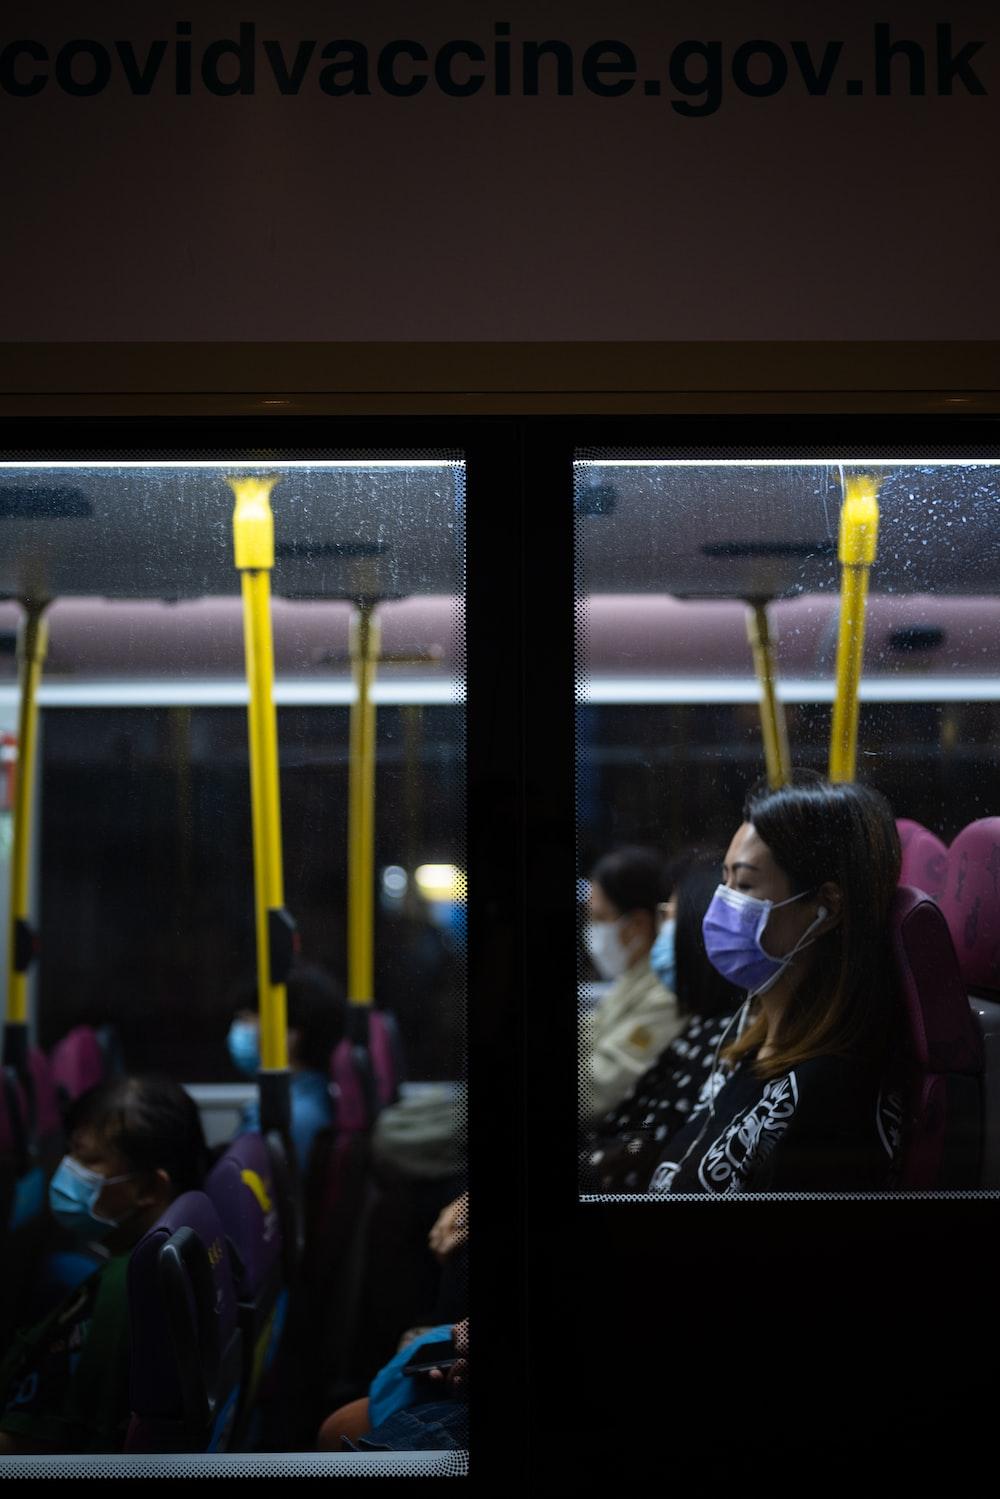 people sitting on train during daytime